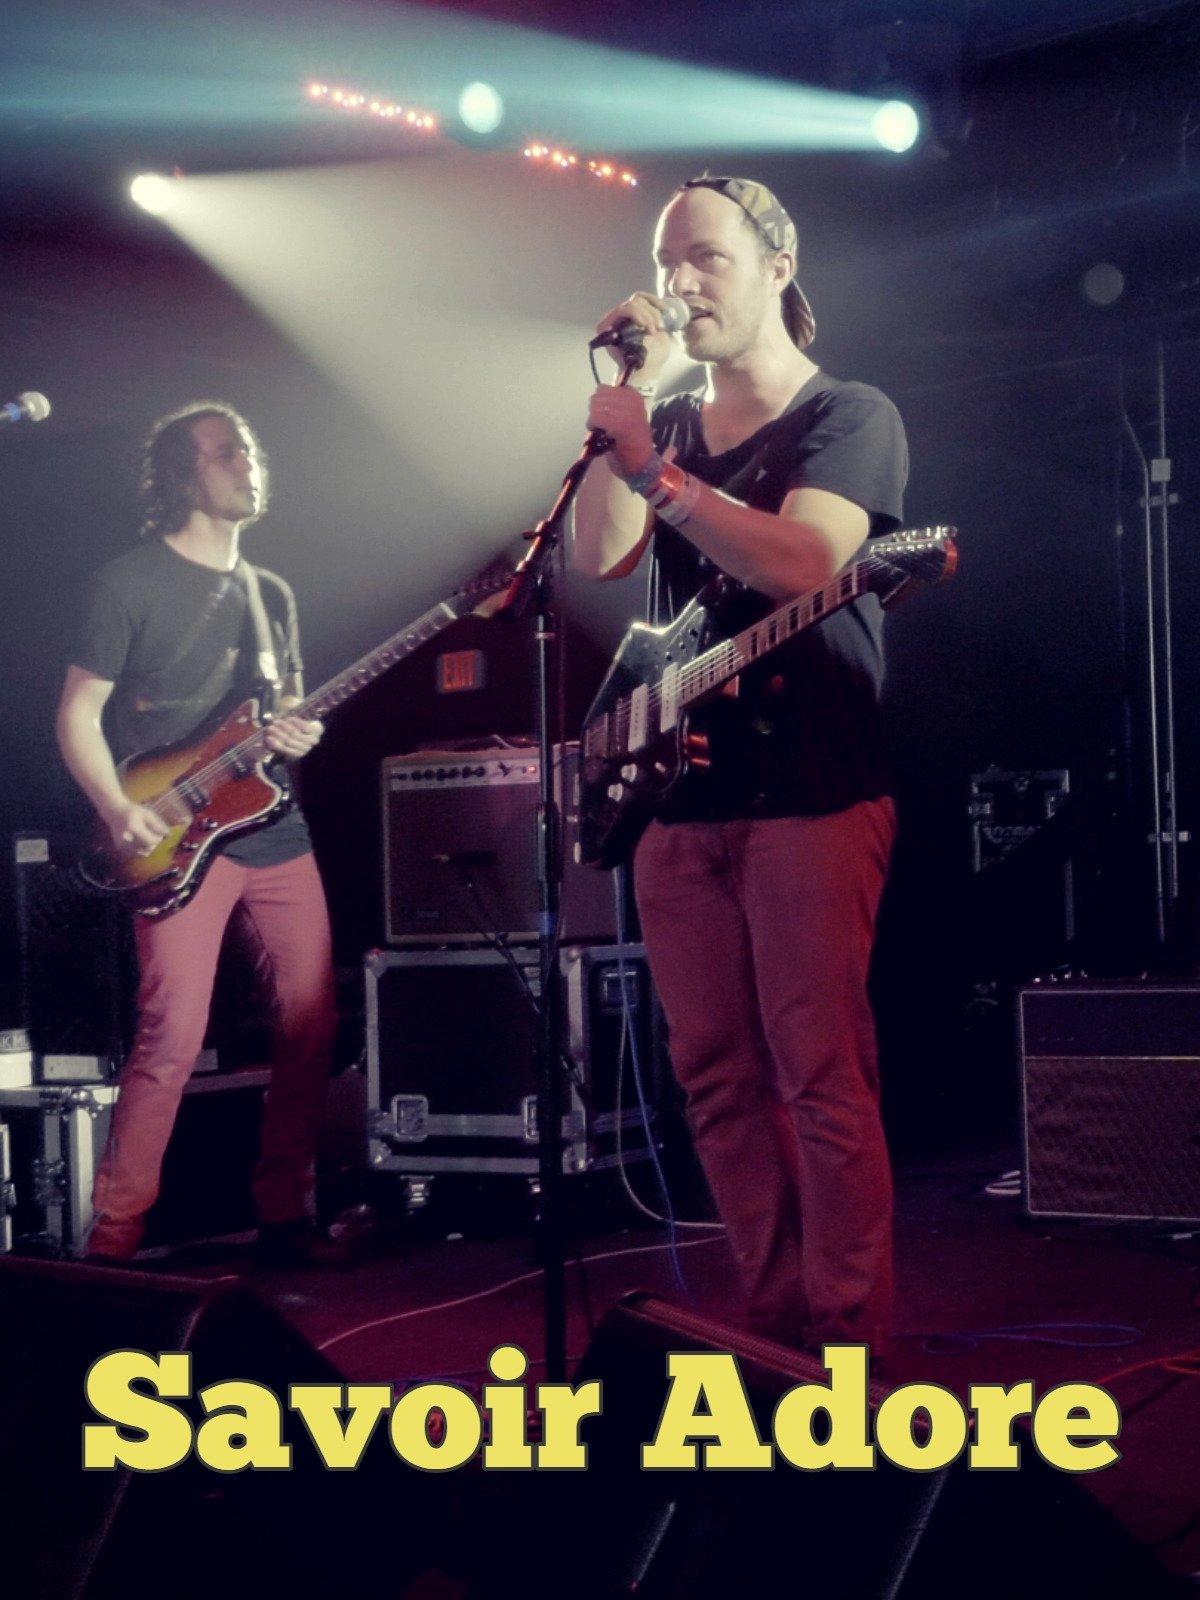 Savoir Adore: Live in Concert